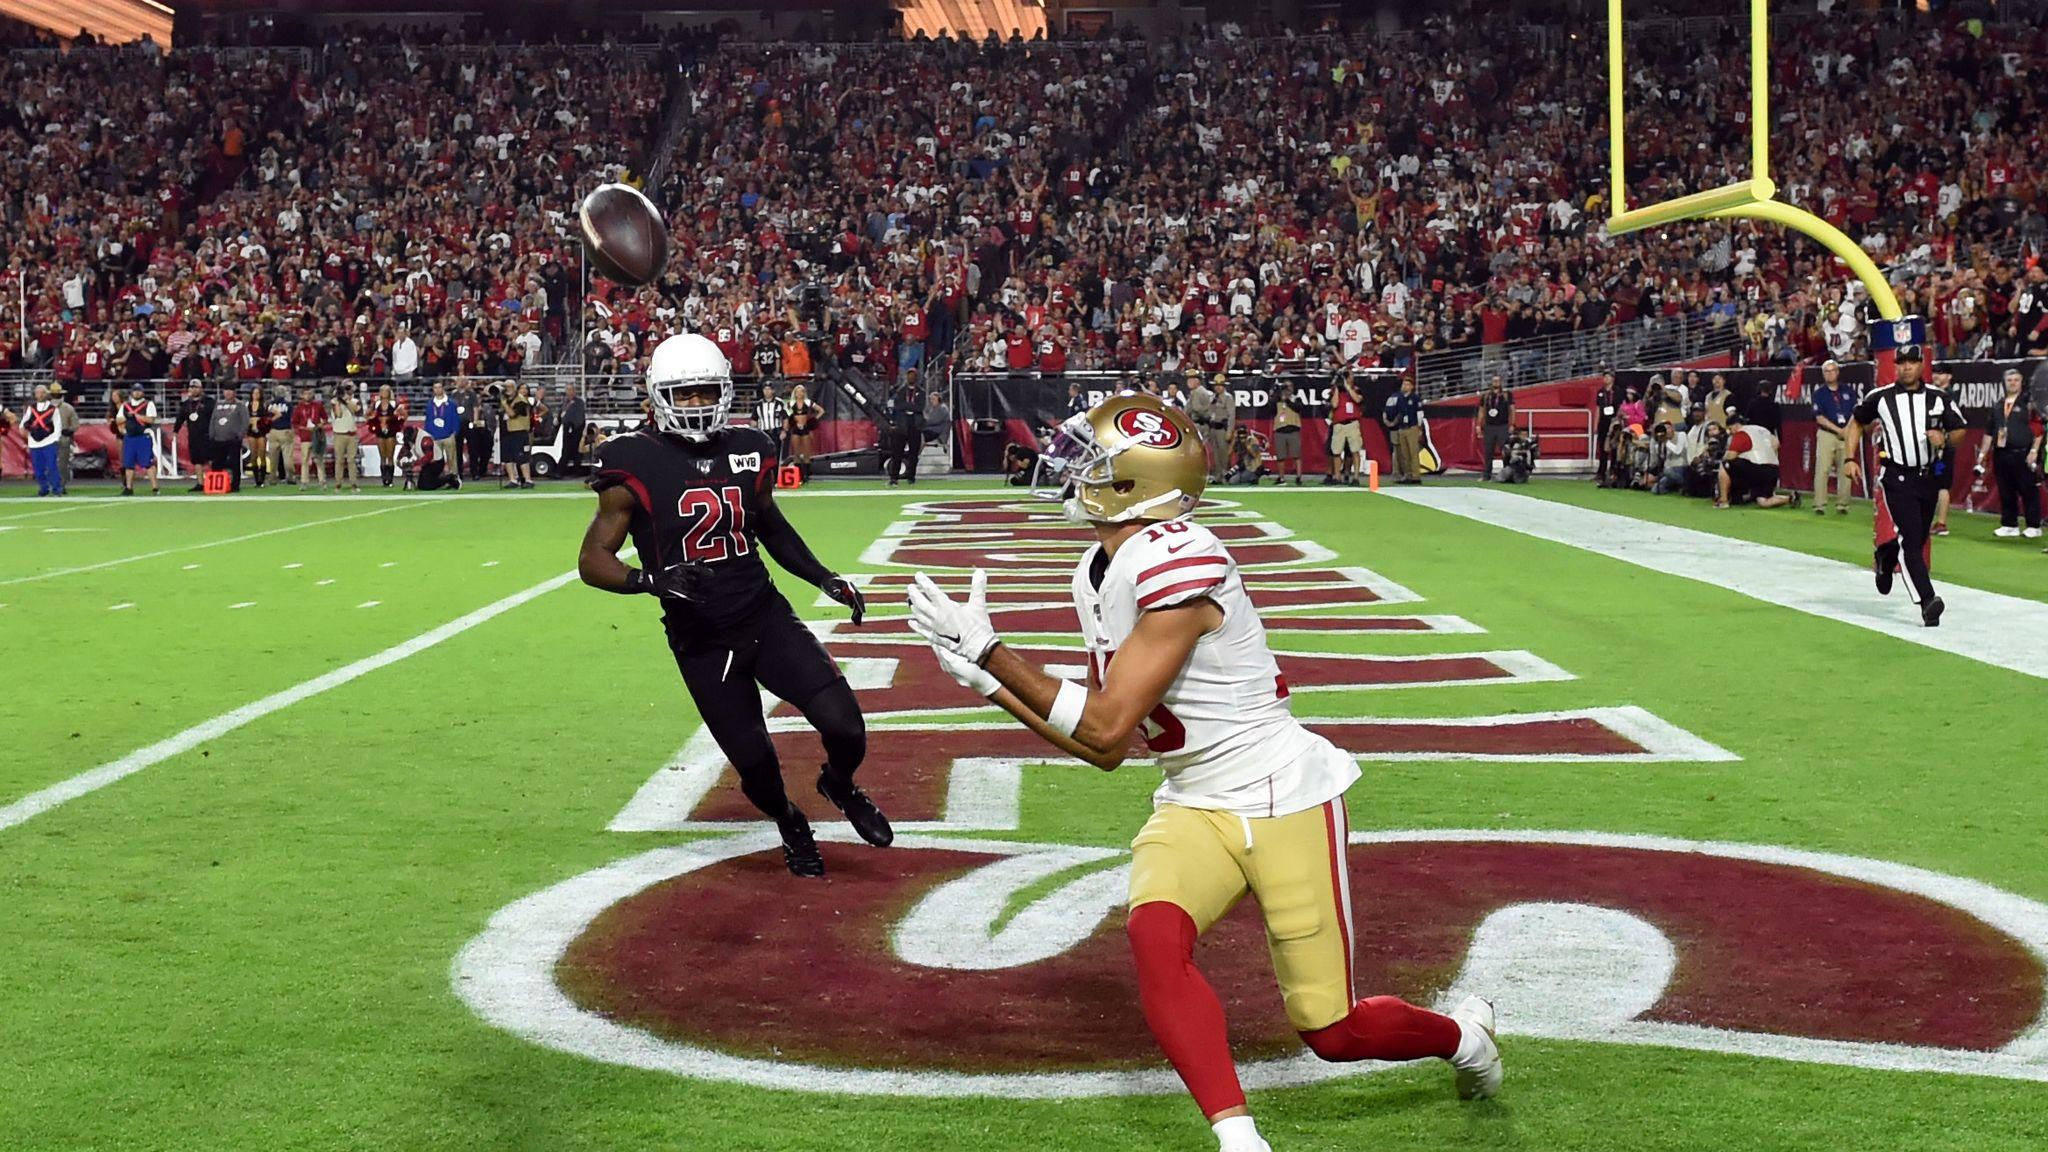 San Francisco 49ers beat Arizona Cardinals 28-25 to stay perfect